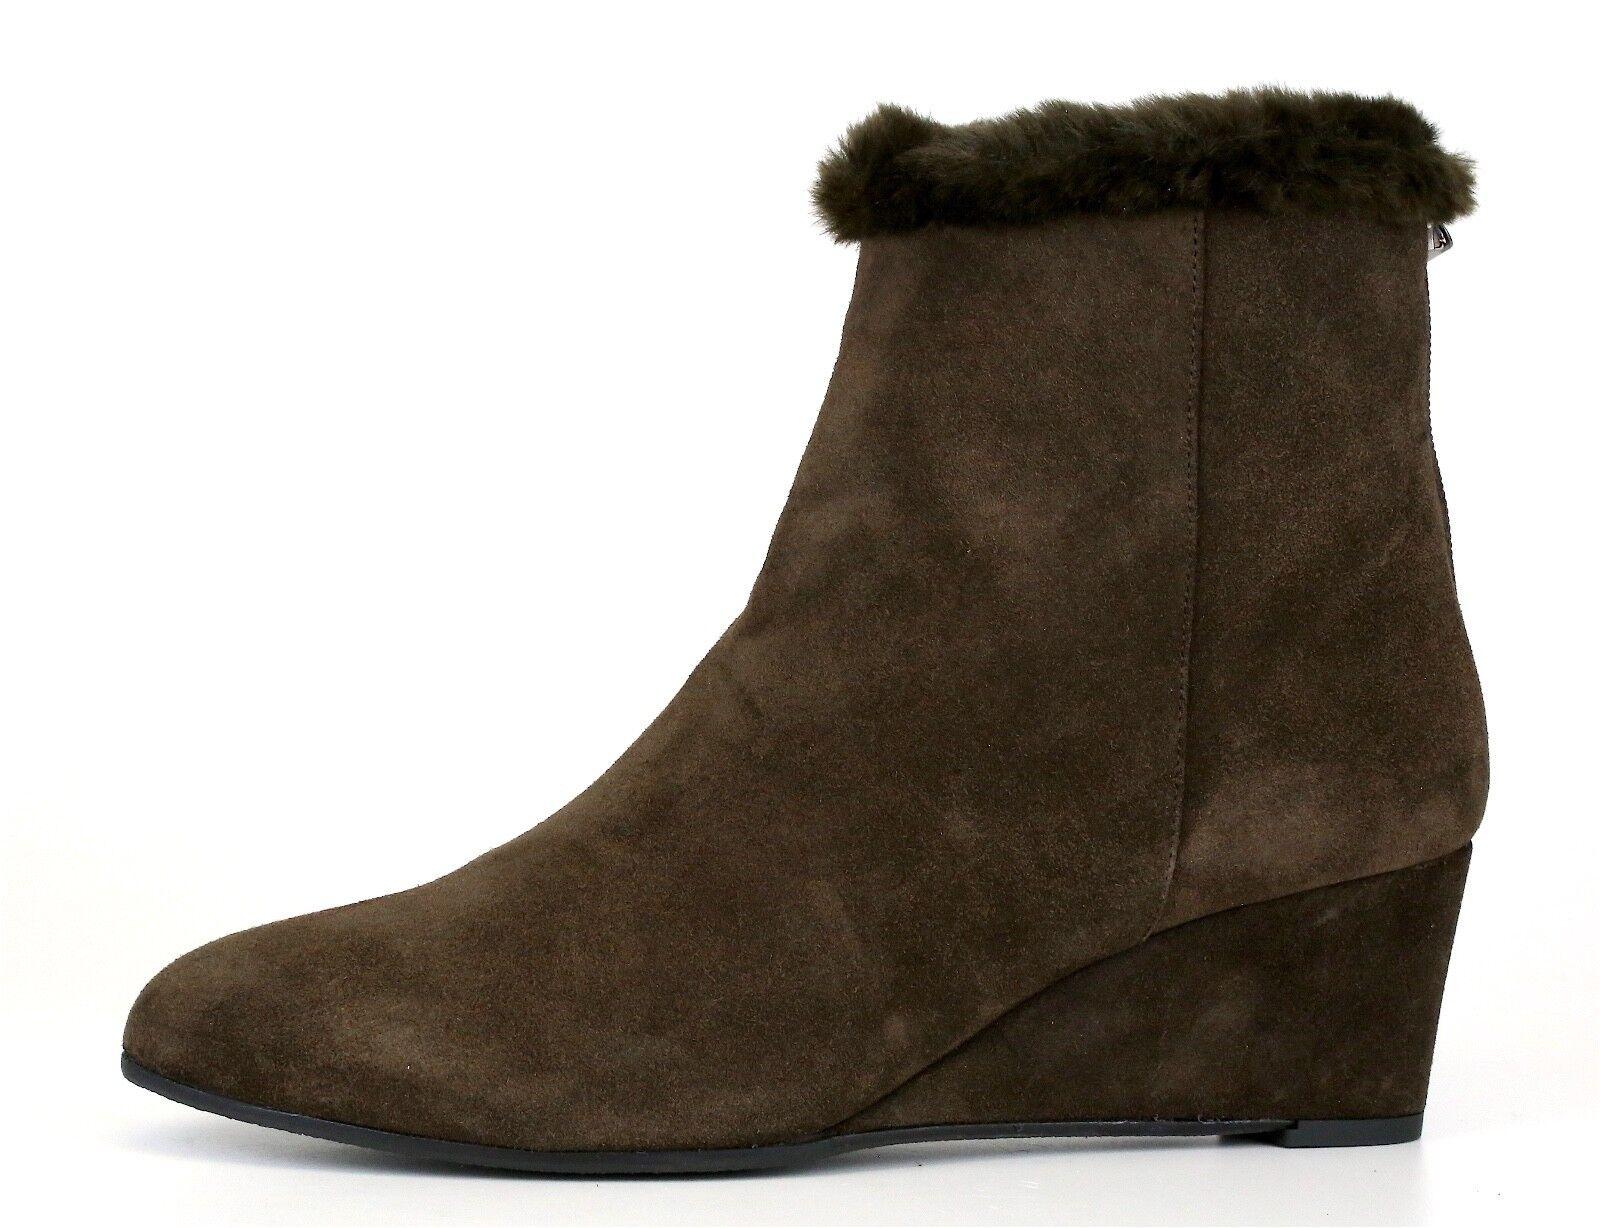 Aquatalia By Marvin K Jinx Fur Trimmed Suede Ankle Boot Brown Women Sz 6.5 5137*